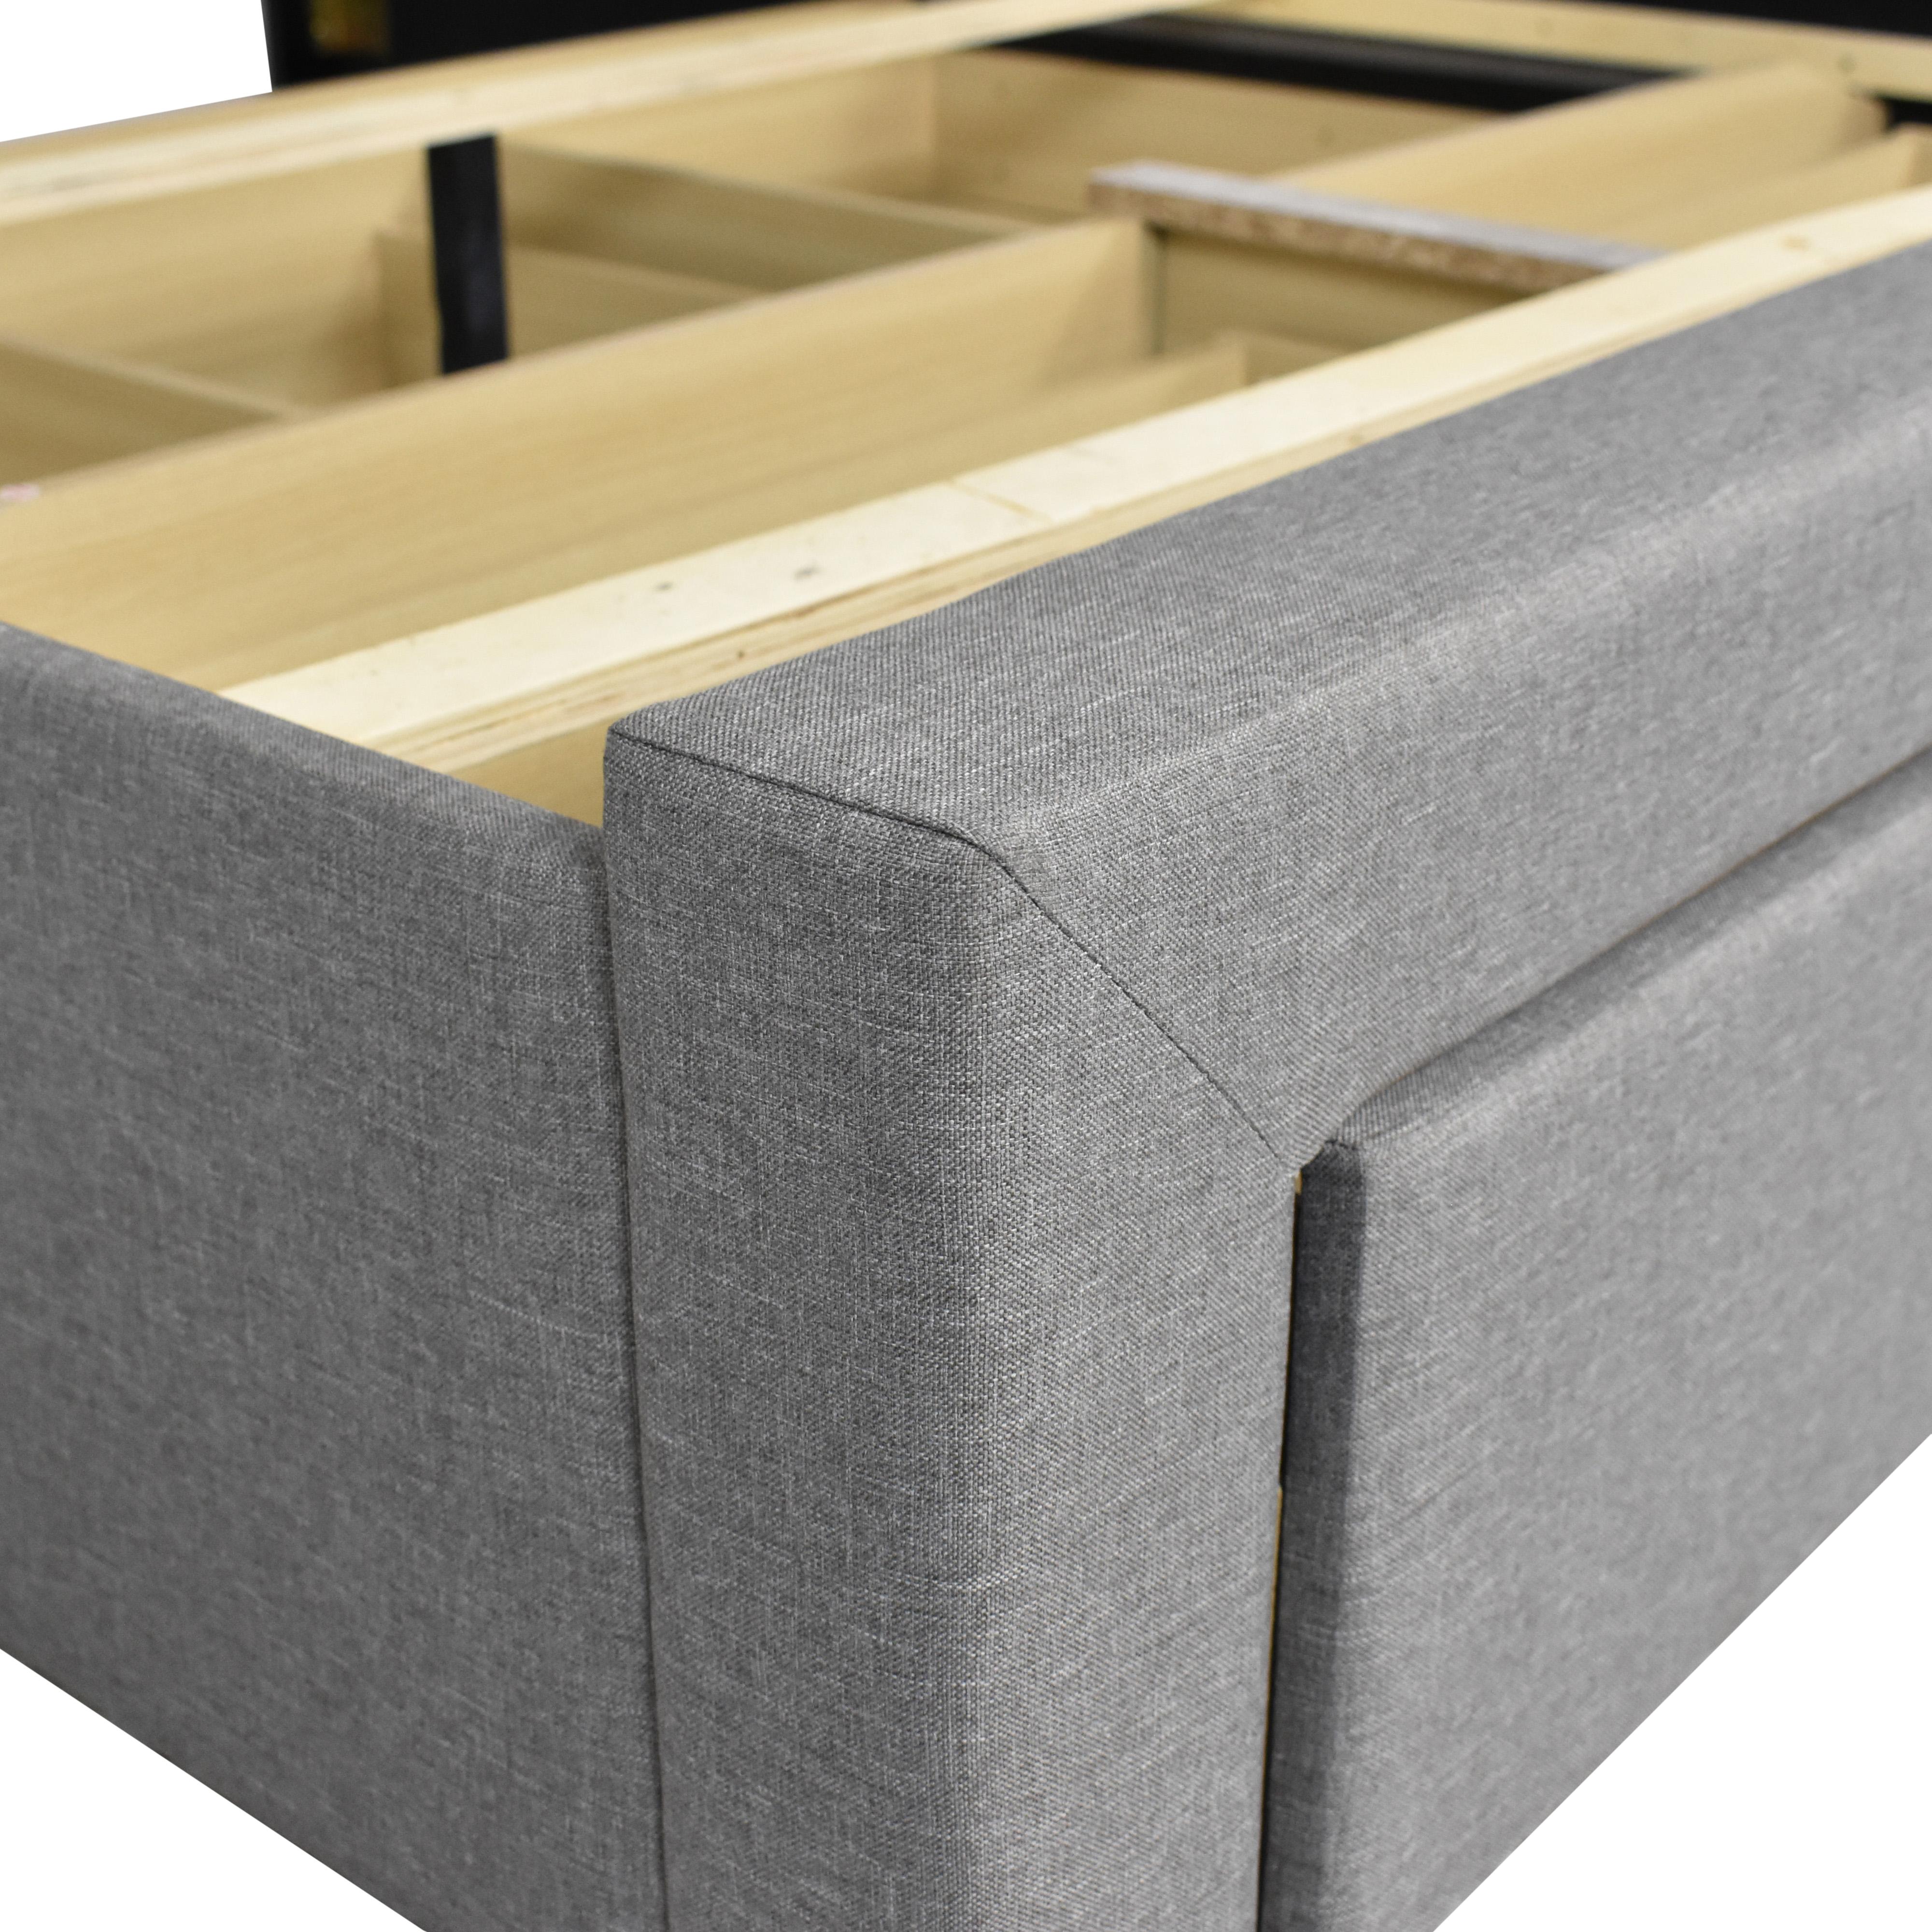 Strick & Bolton Strick & Bolton Wingback Queen Storage Bed discount